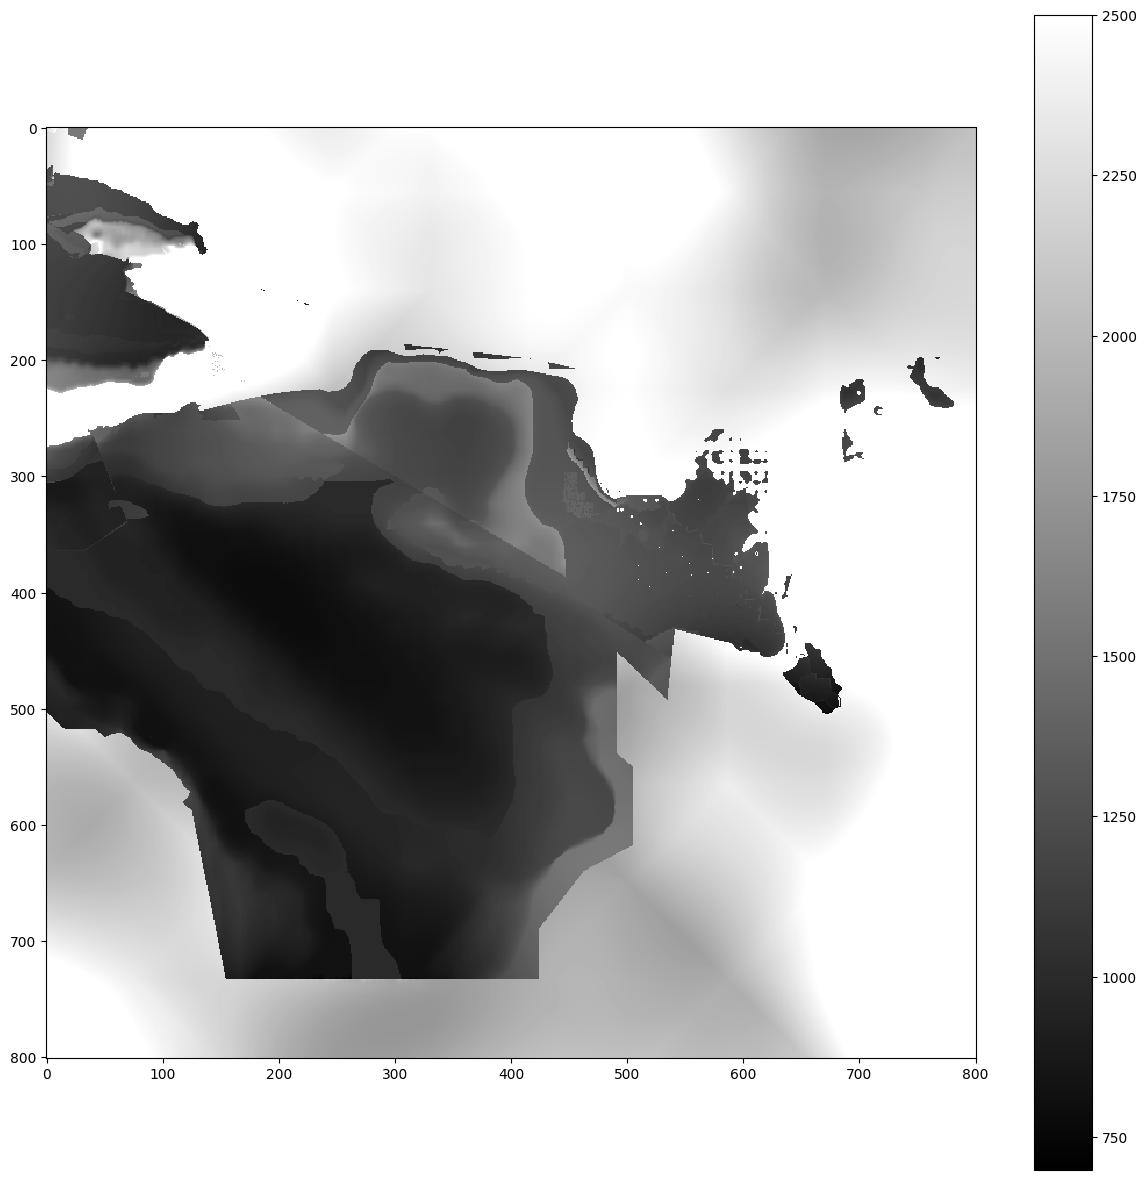 bench/seismic/wp/la_habra/meshes/velocity_model/plots/vs_500.png